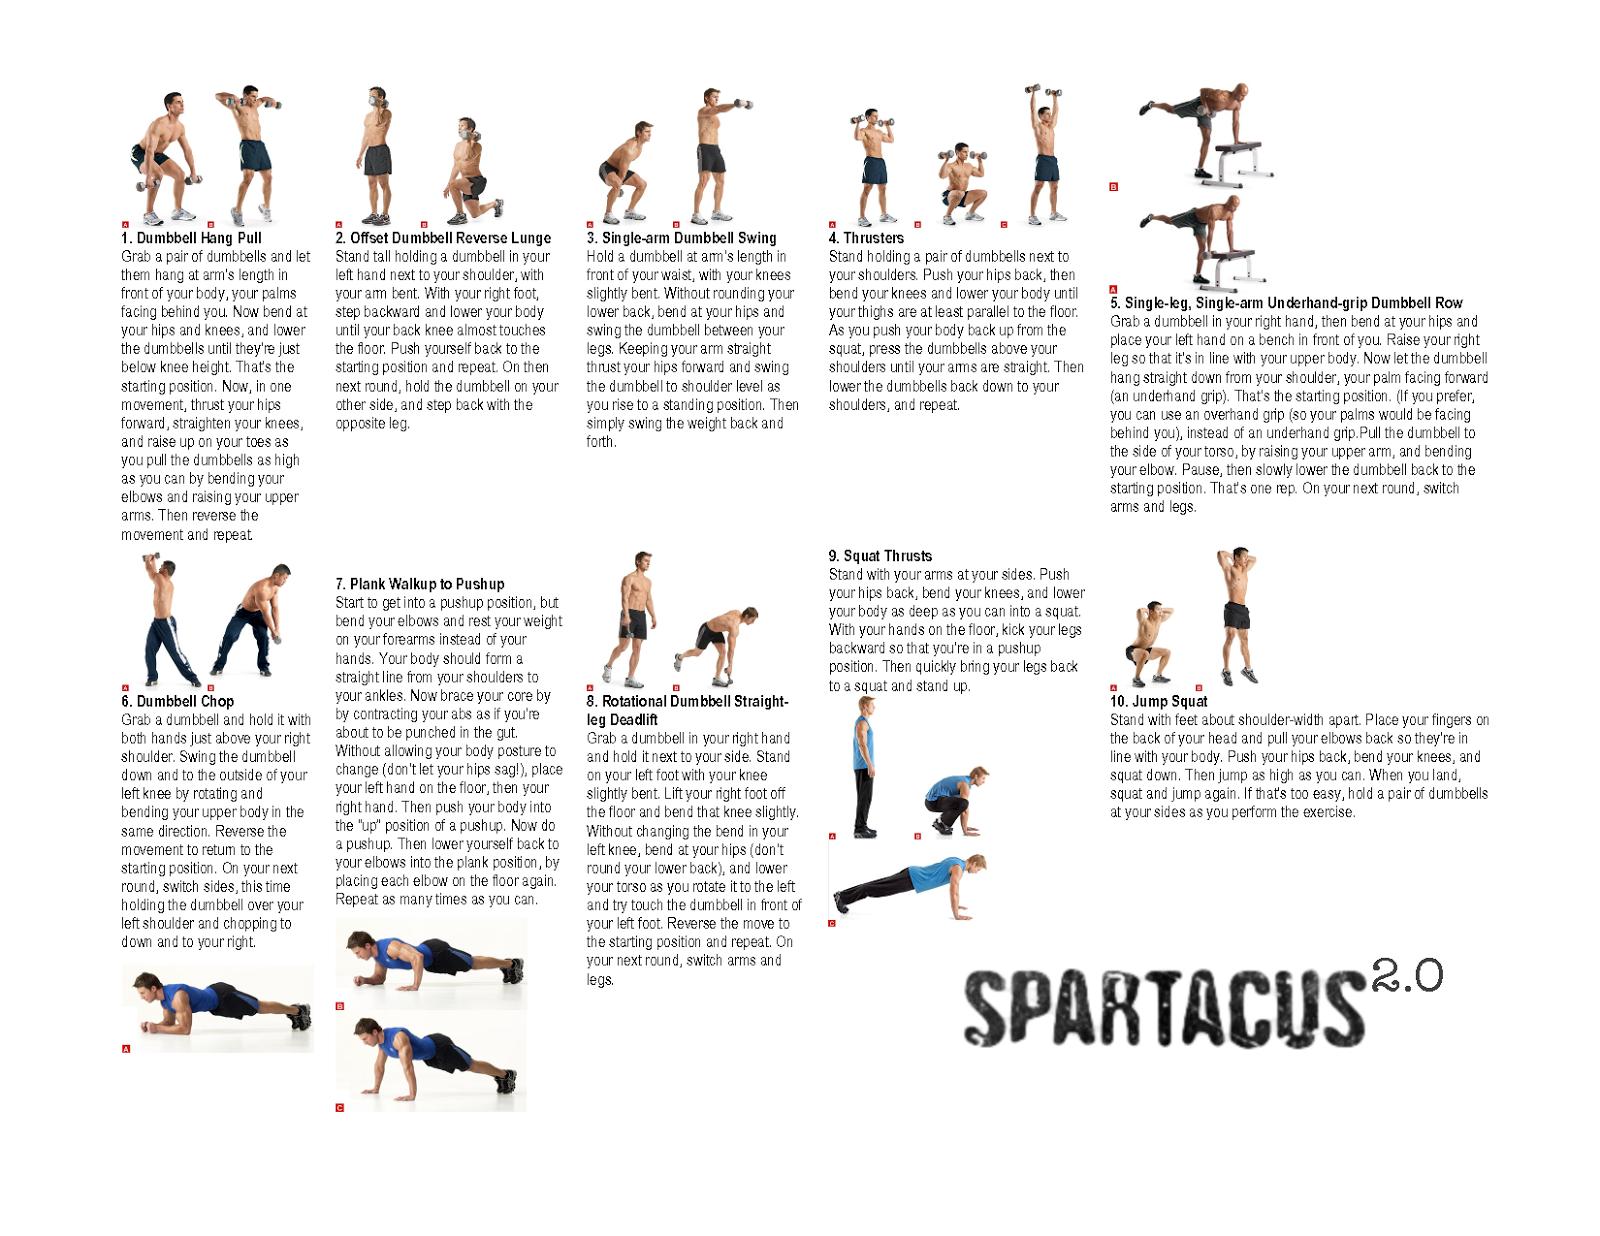 spartacus workout 2014